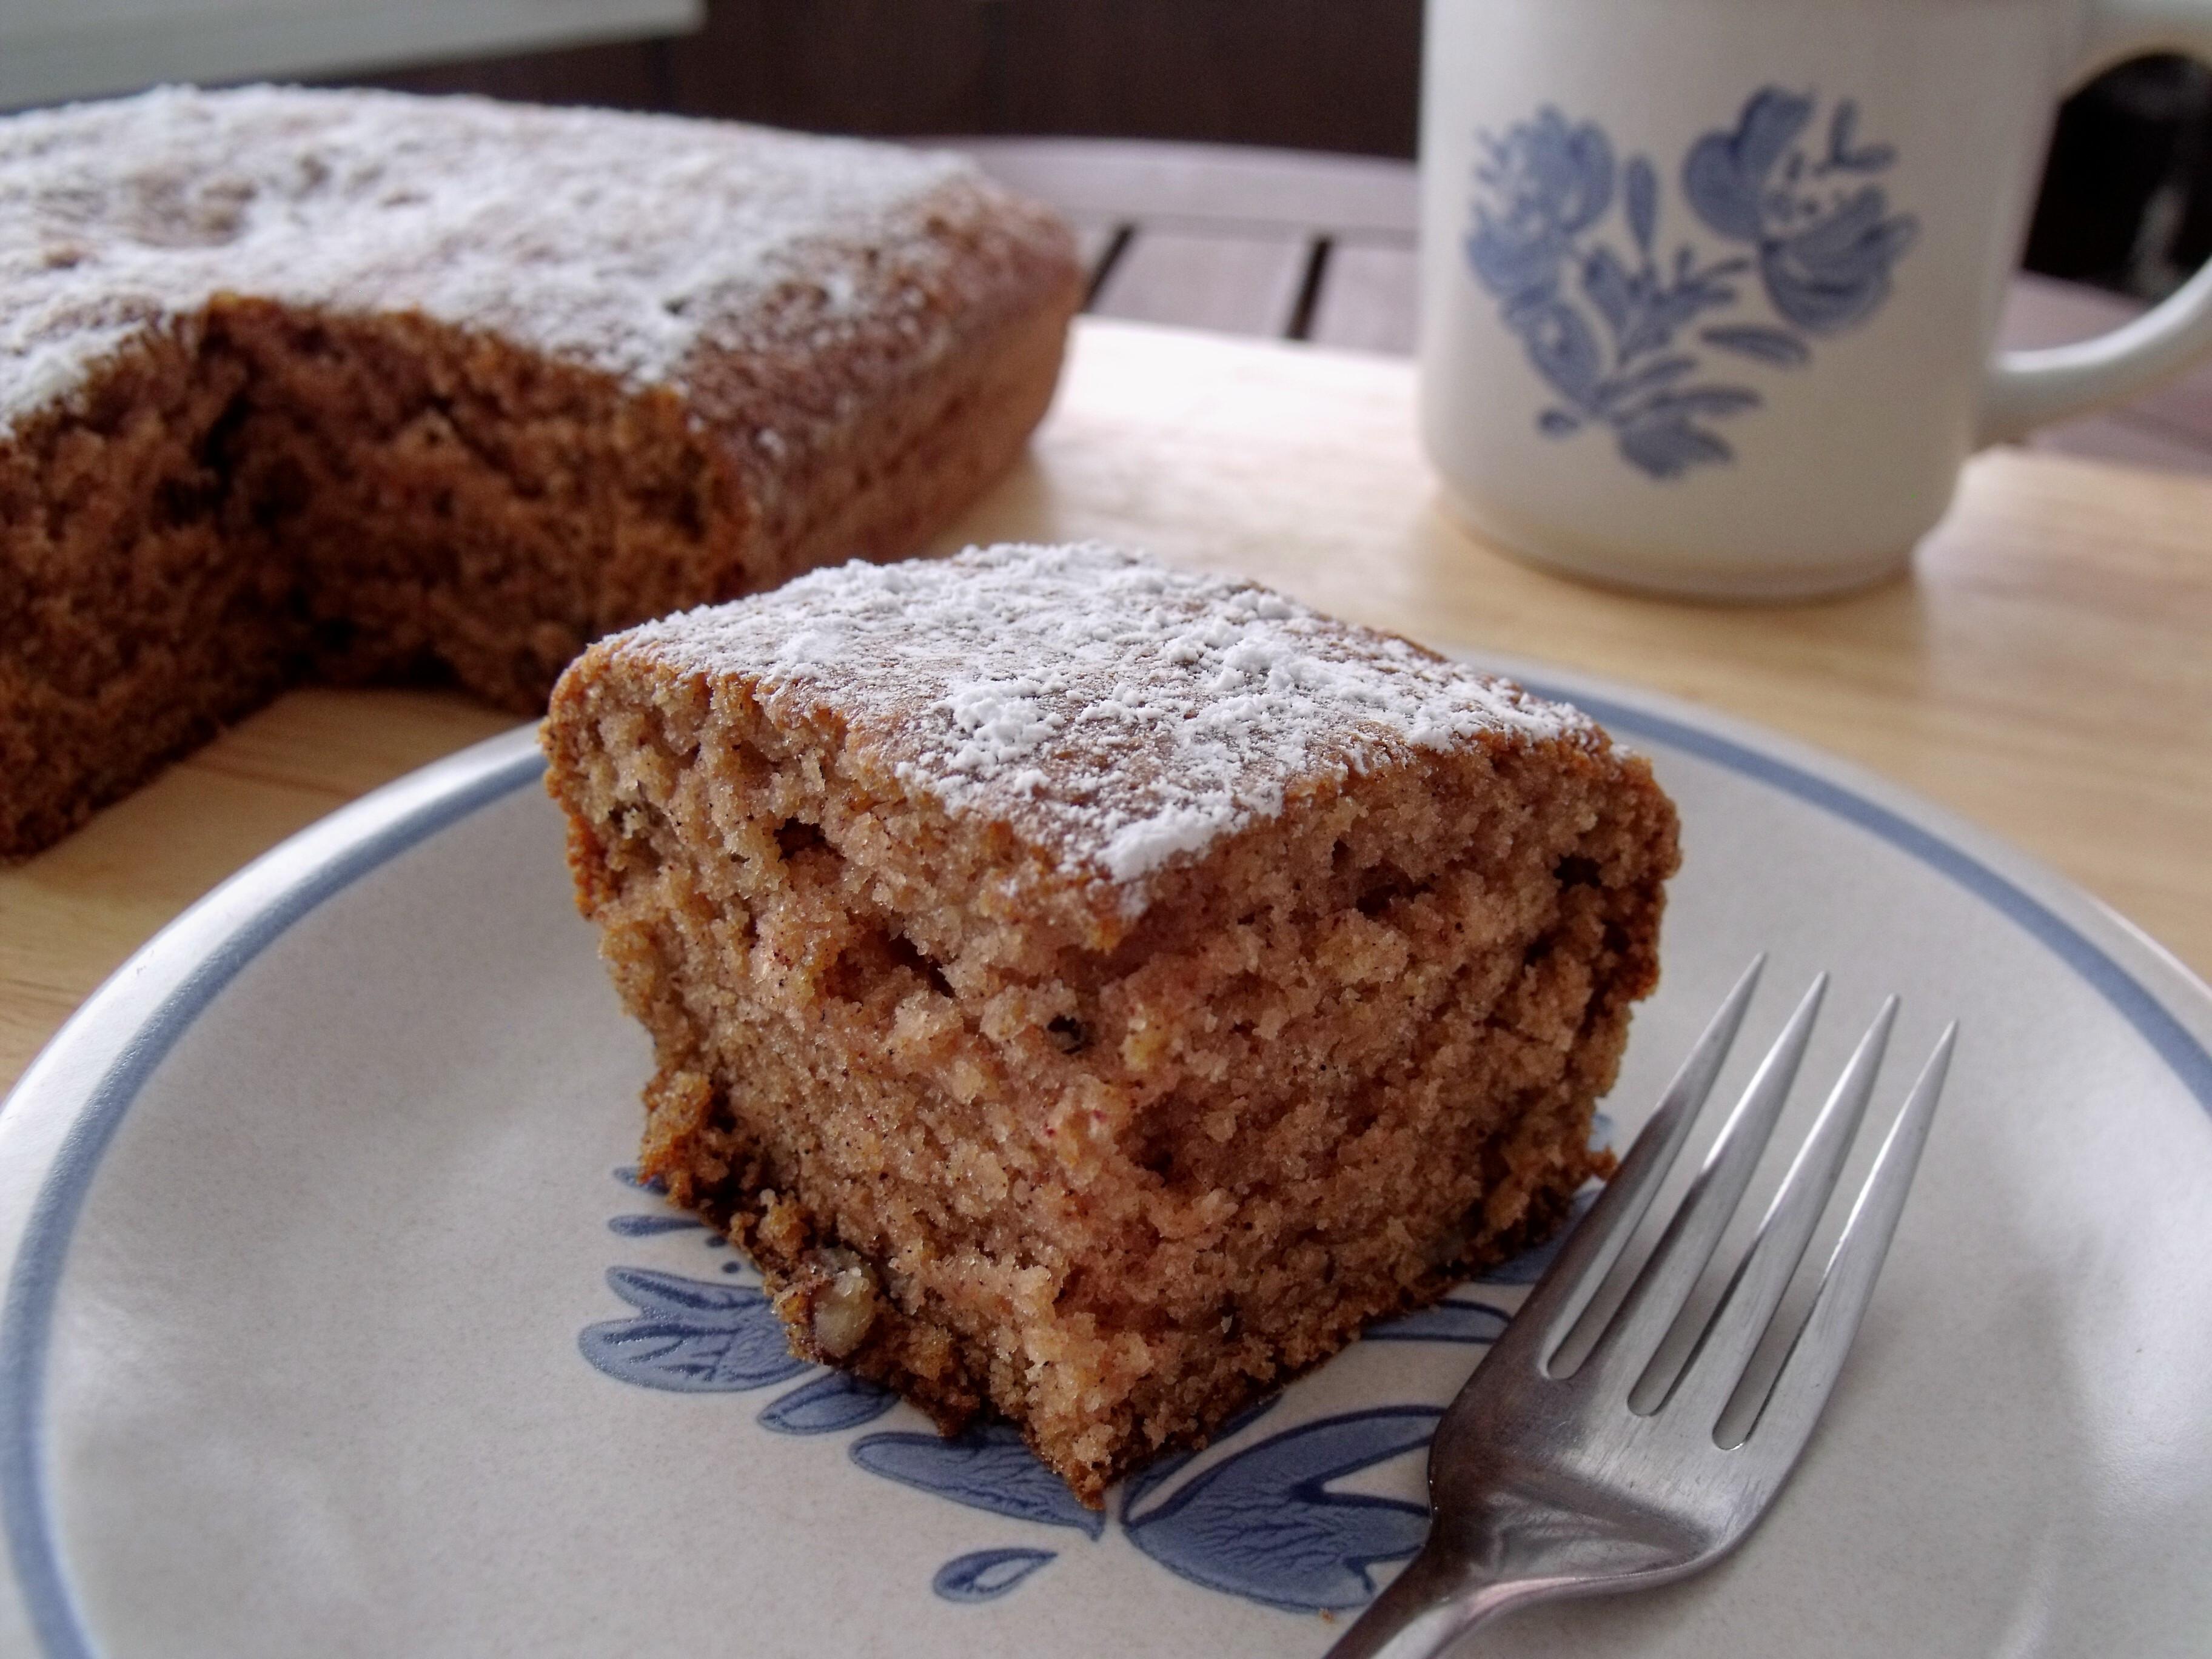 Applesauce Cake Recipe  Applesauce Pecan Spice Cake Cindy s Recipes and Writings